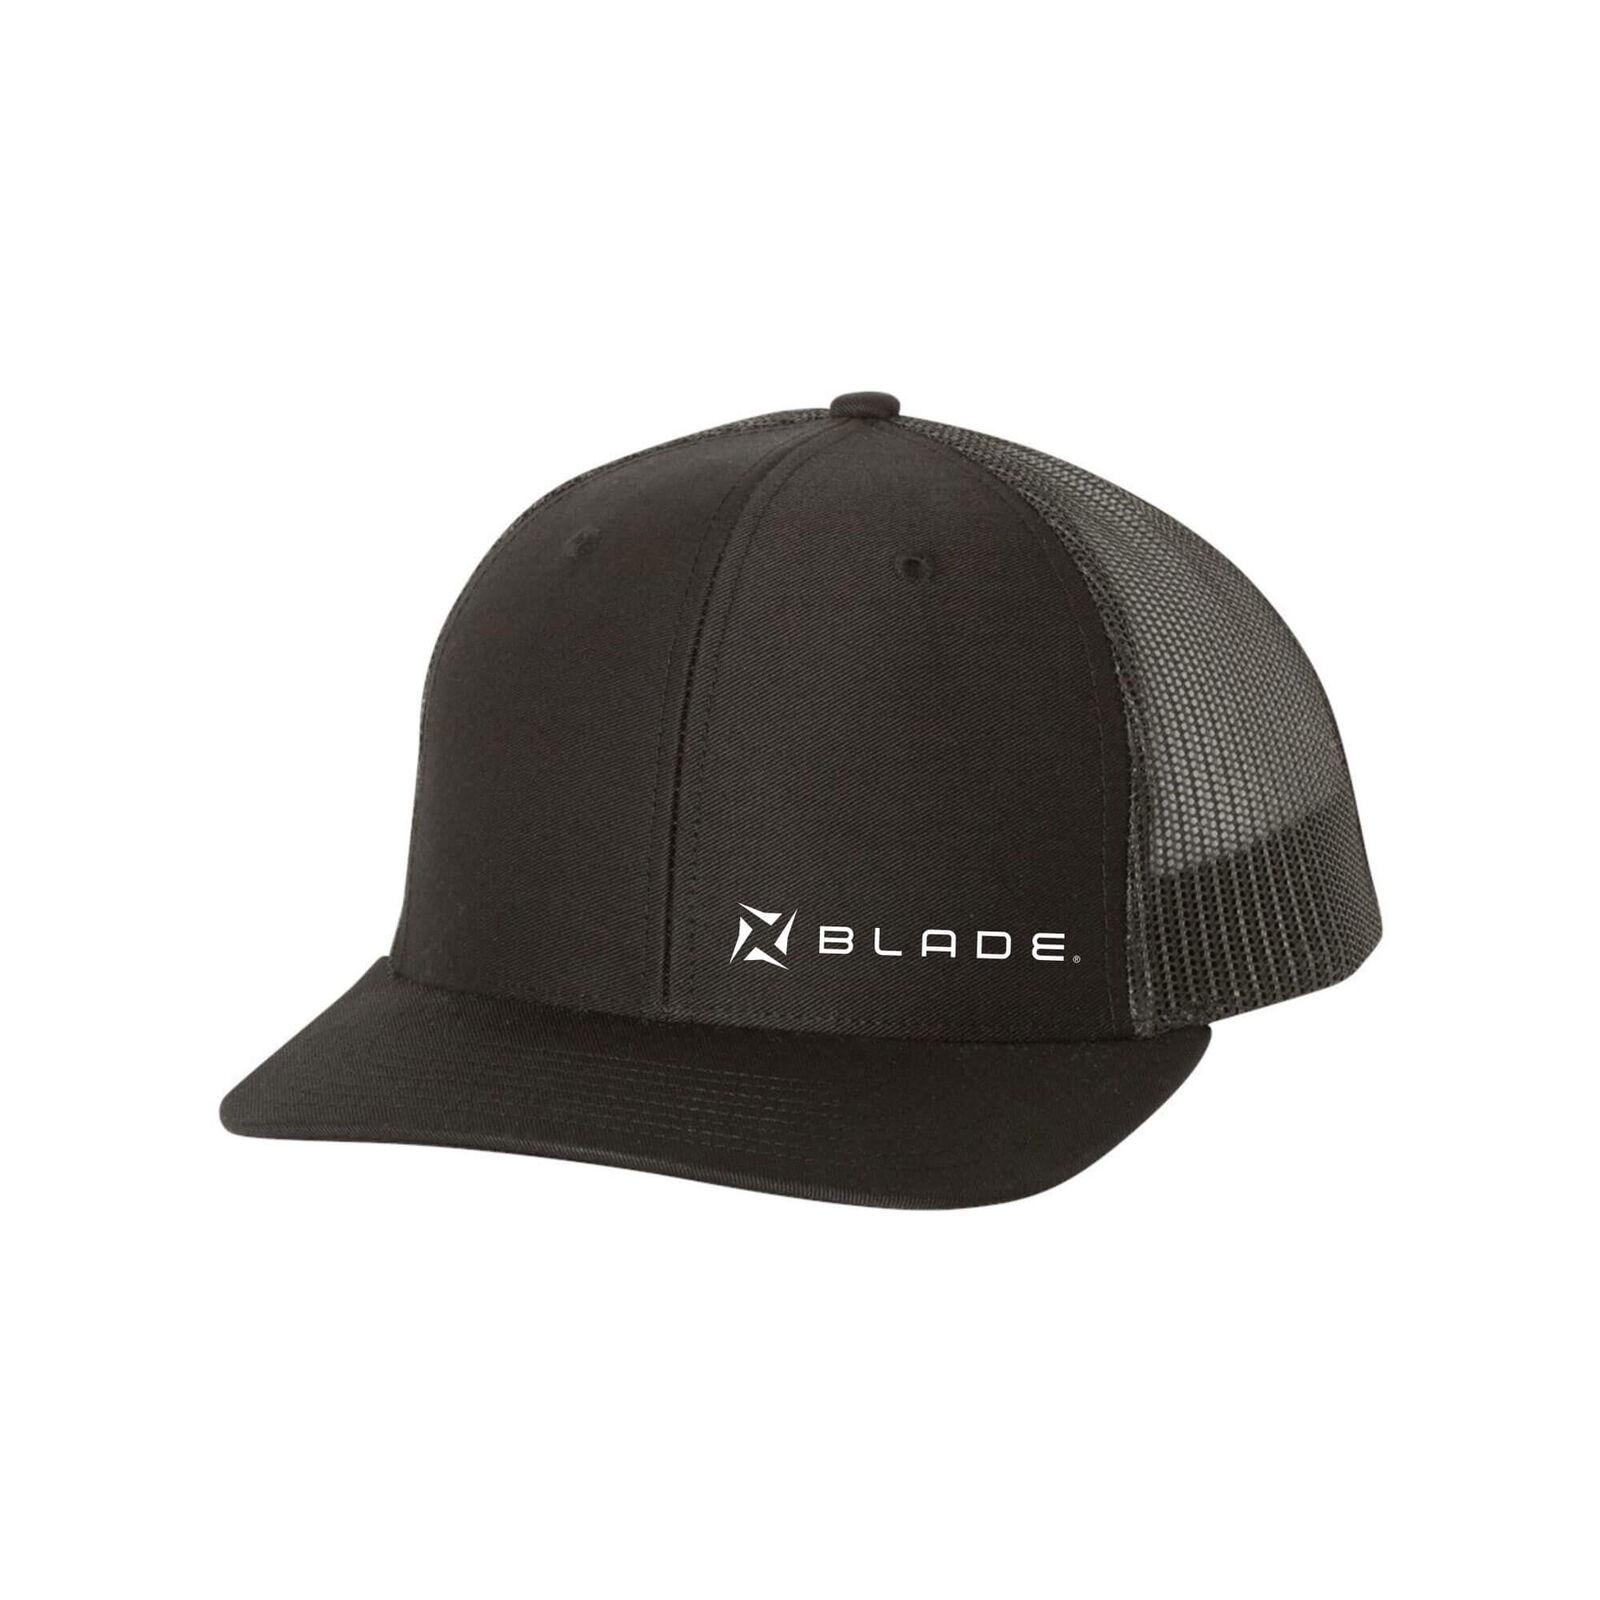 Blade Snap Back Hat/Cap Charcoal Black